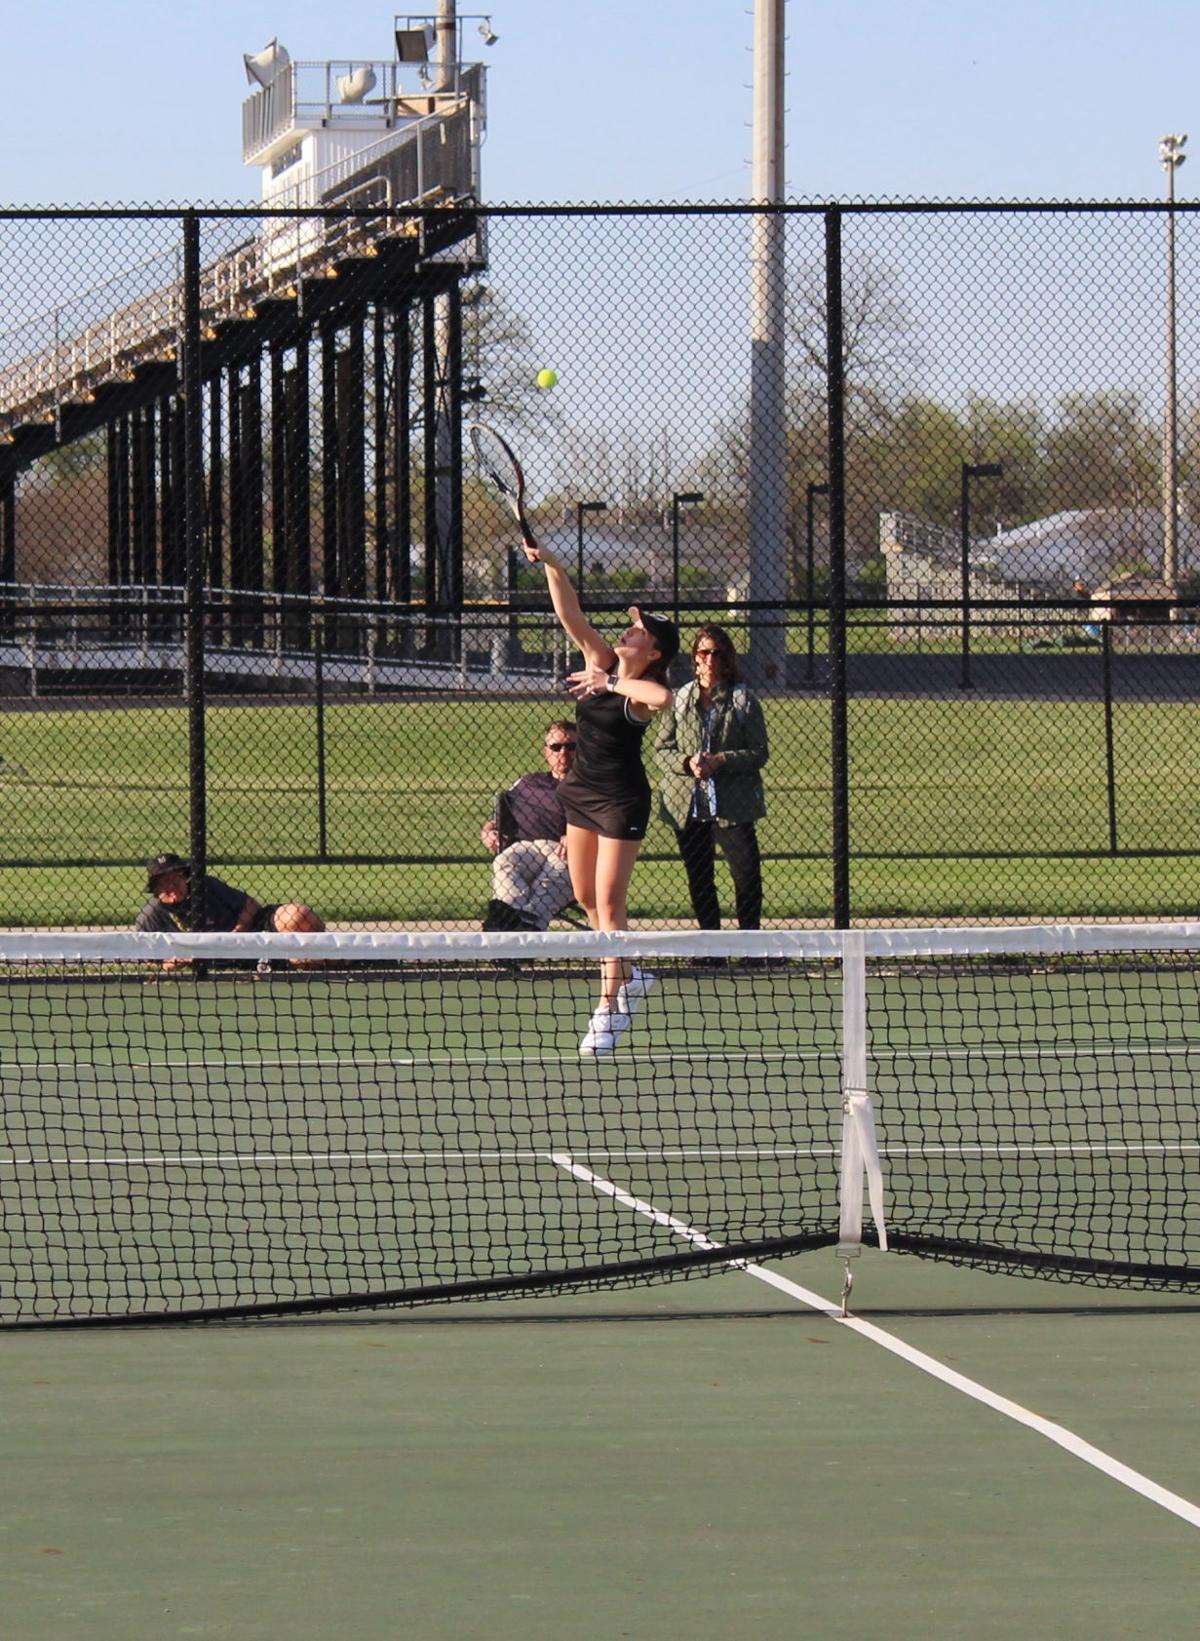 Secondary Shelbyville tennis photo